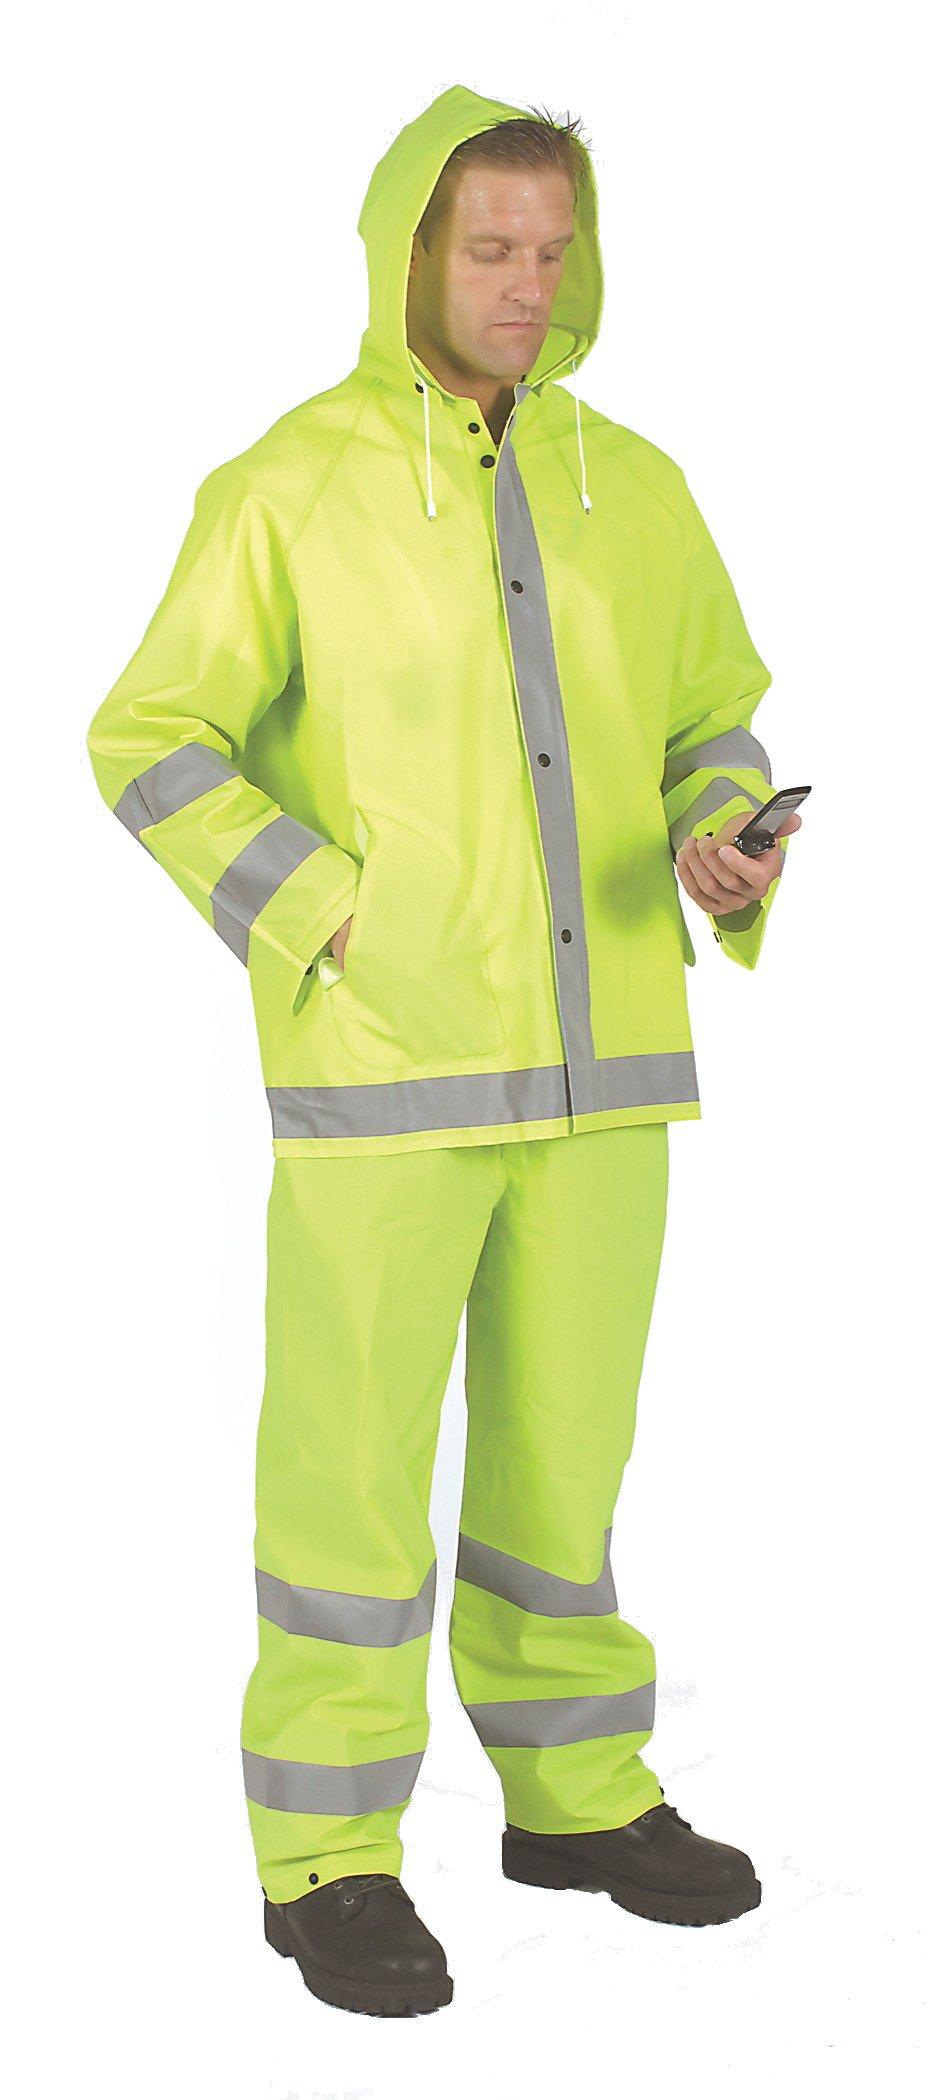 Galeton 8000975-XXL 8000975 Repel Rainwear Reflective 0.35 mm PVC Rain Suit, Lime, XX-Large